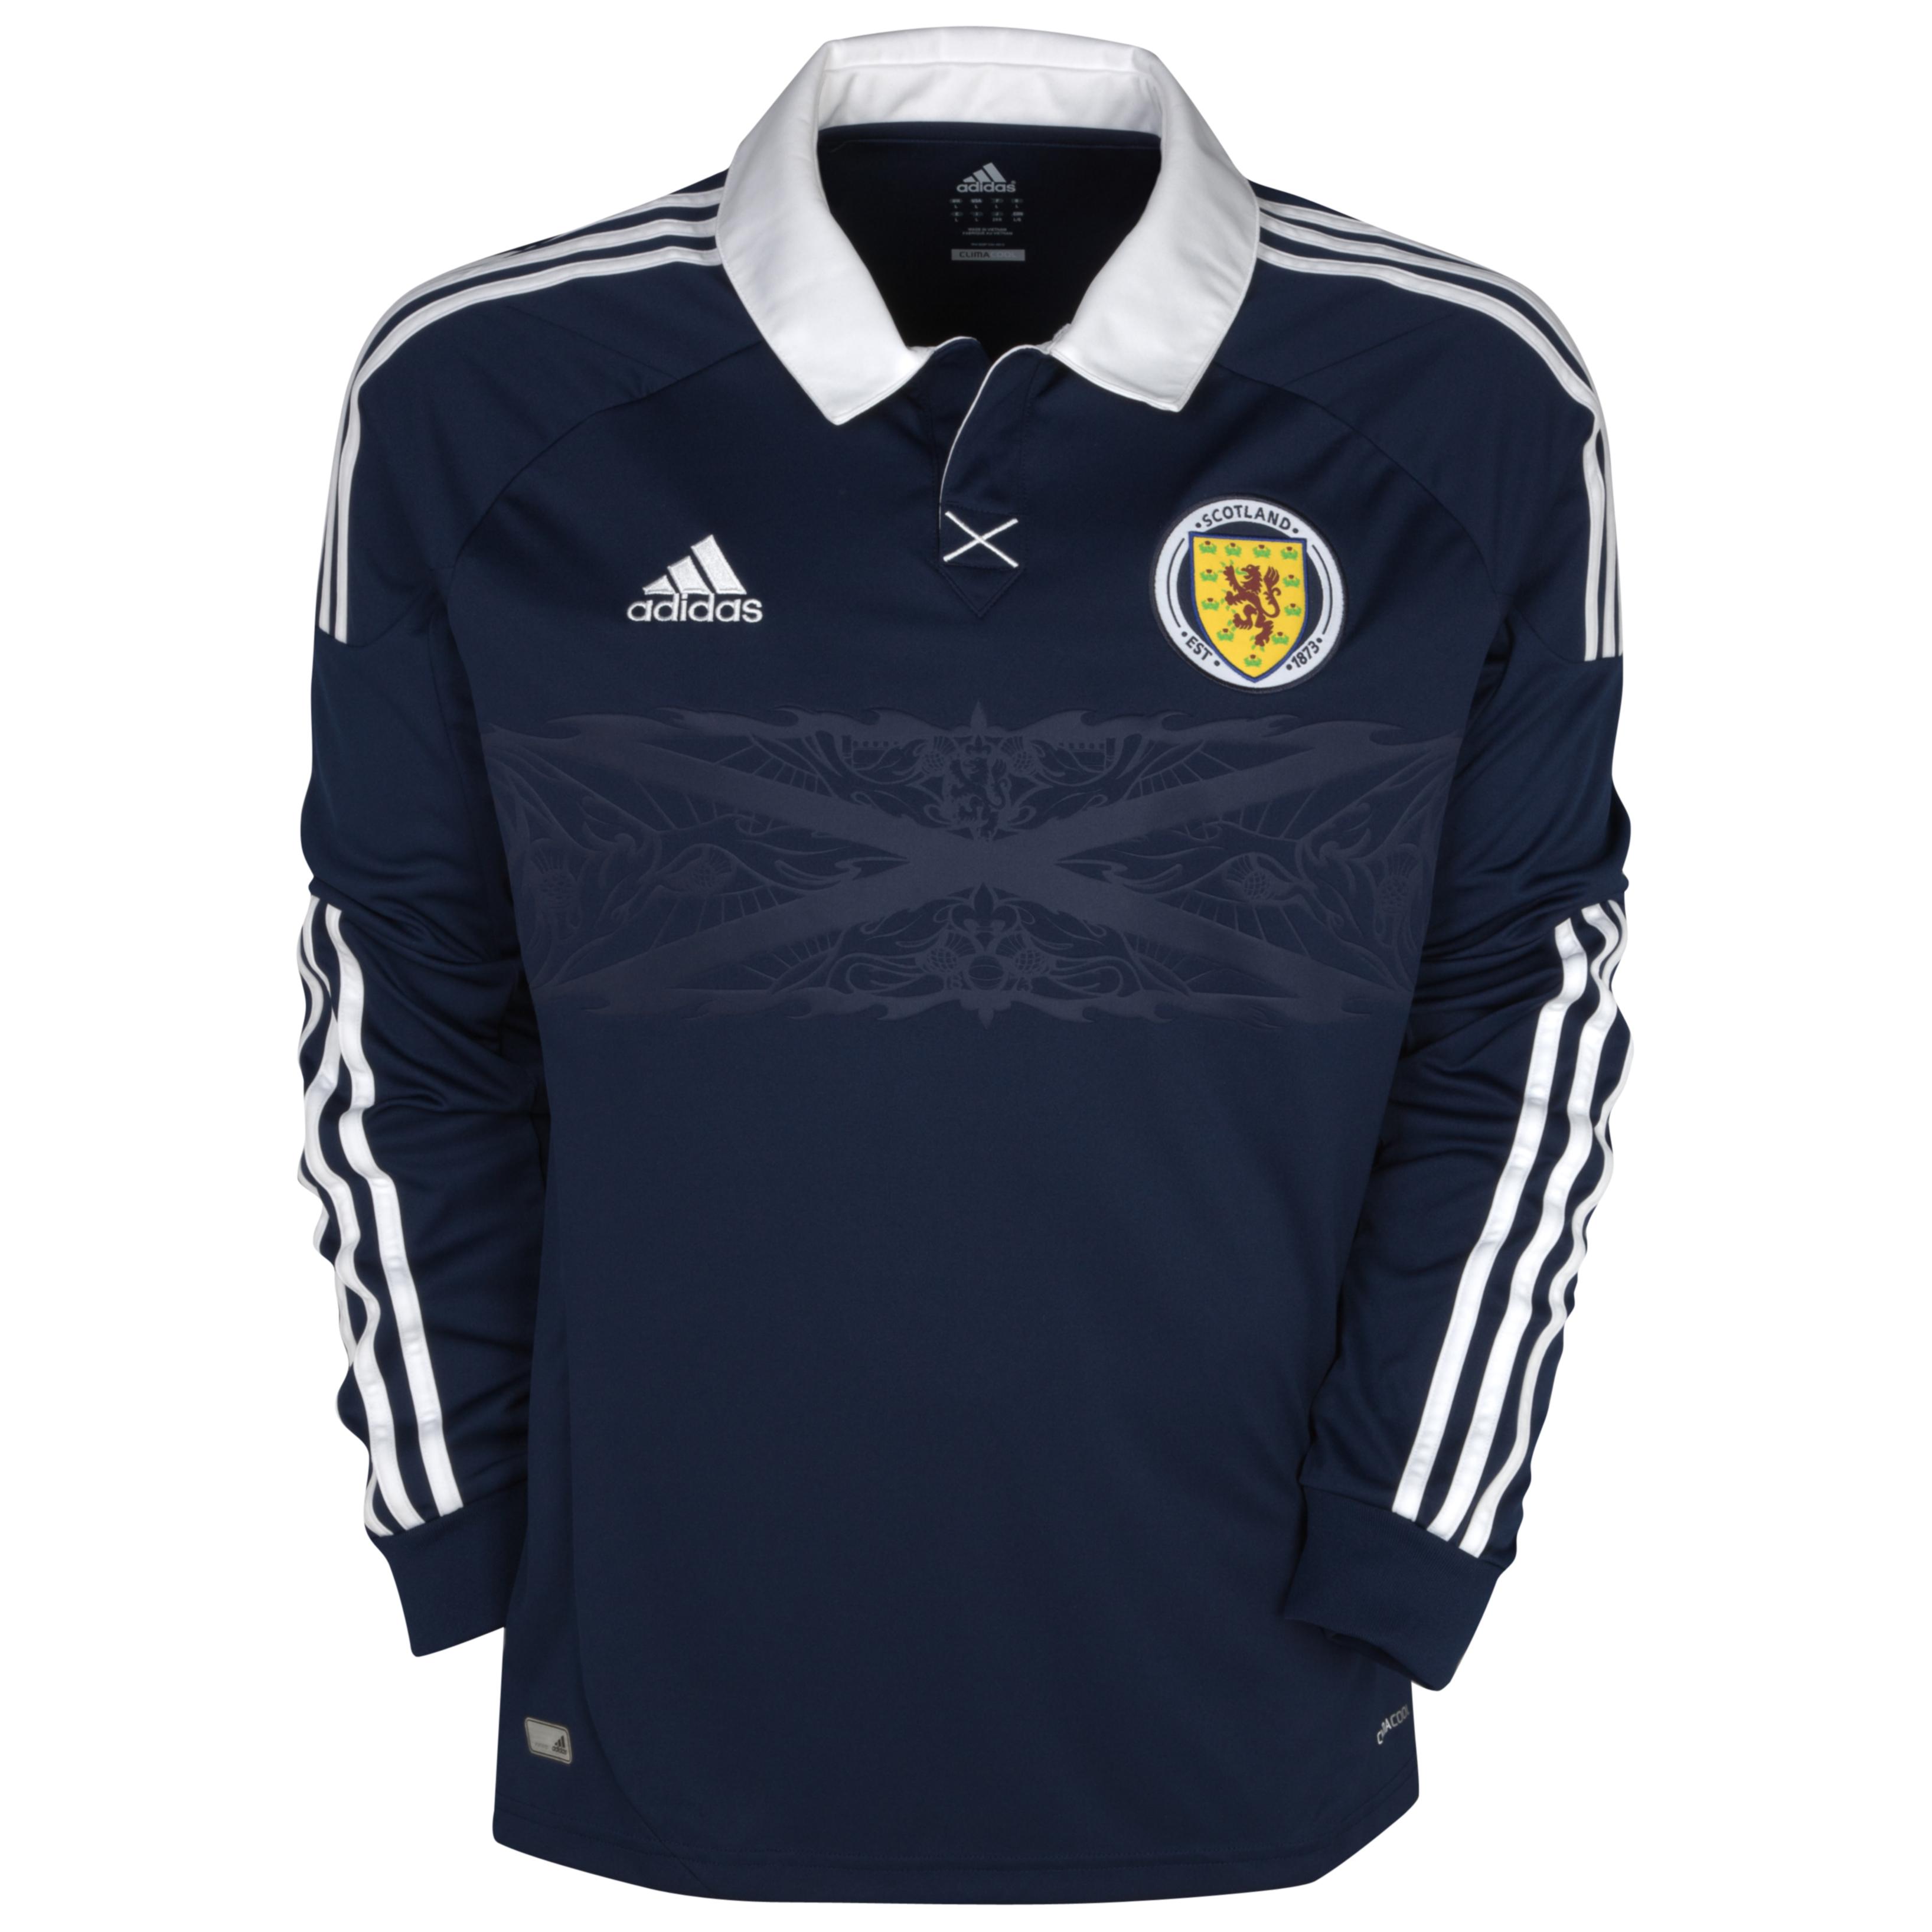 Scotland Home Shirt 2012/14 - Long Sleeved - Dark Indigo/White